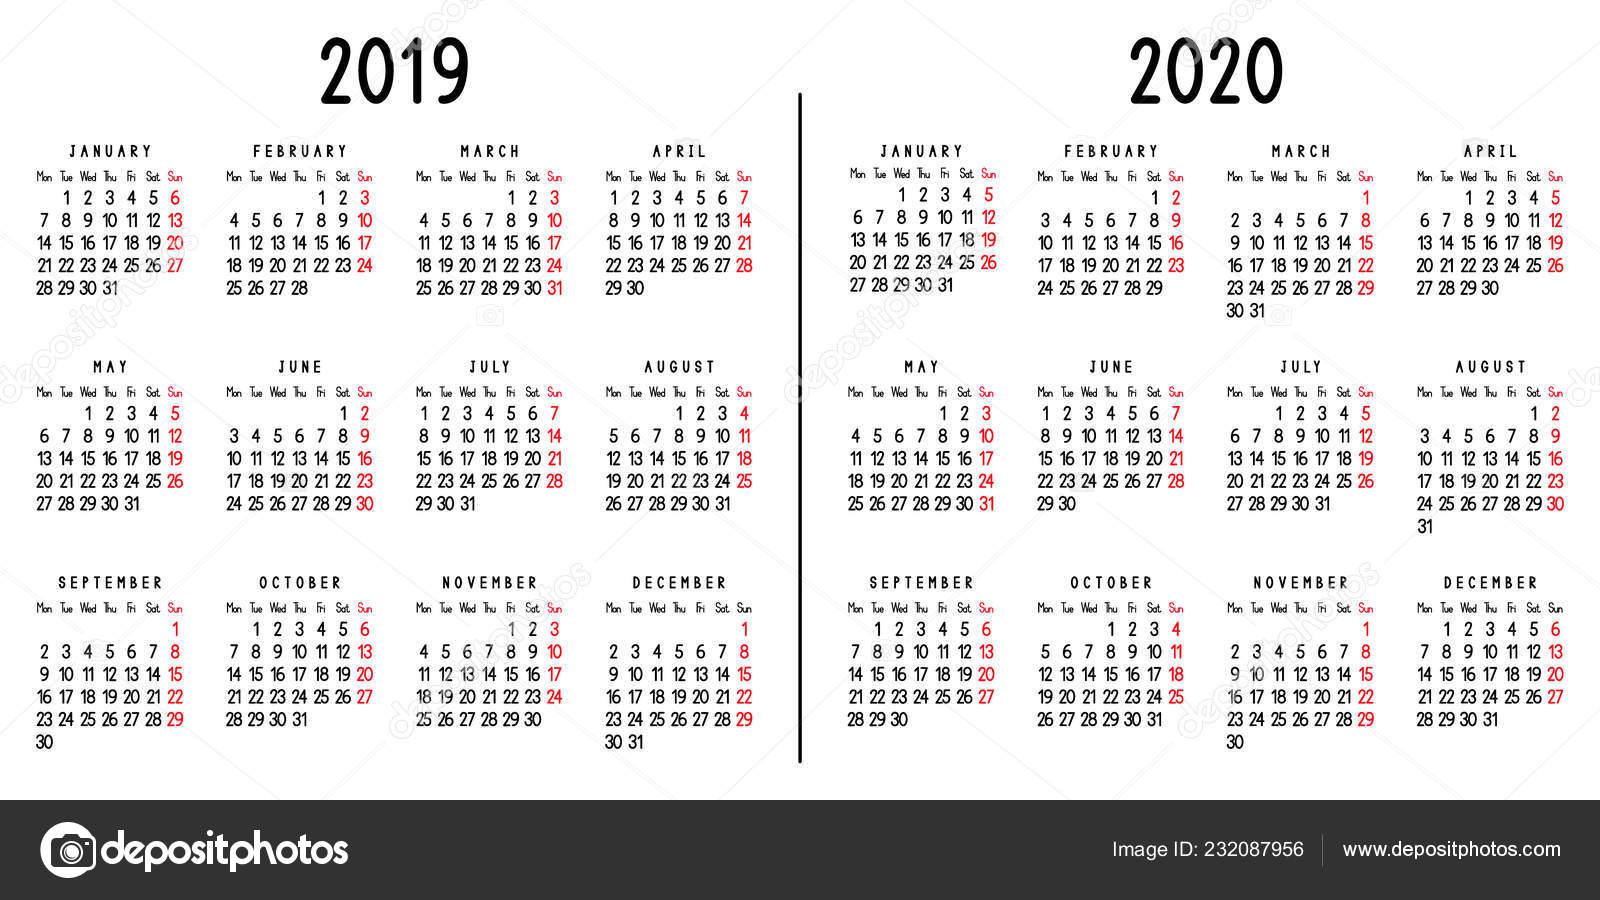 Calendario 2020 Con Week.Calendar 2019 2020 Week Starts Monday Vector Illustration